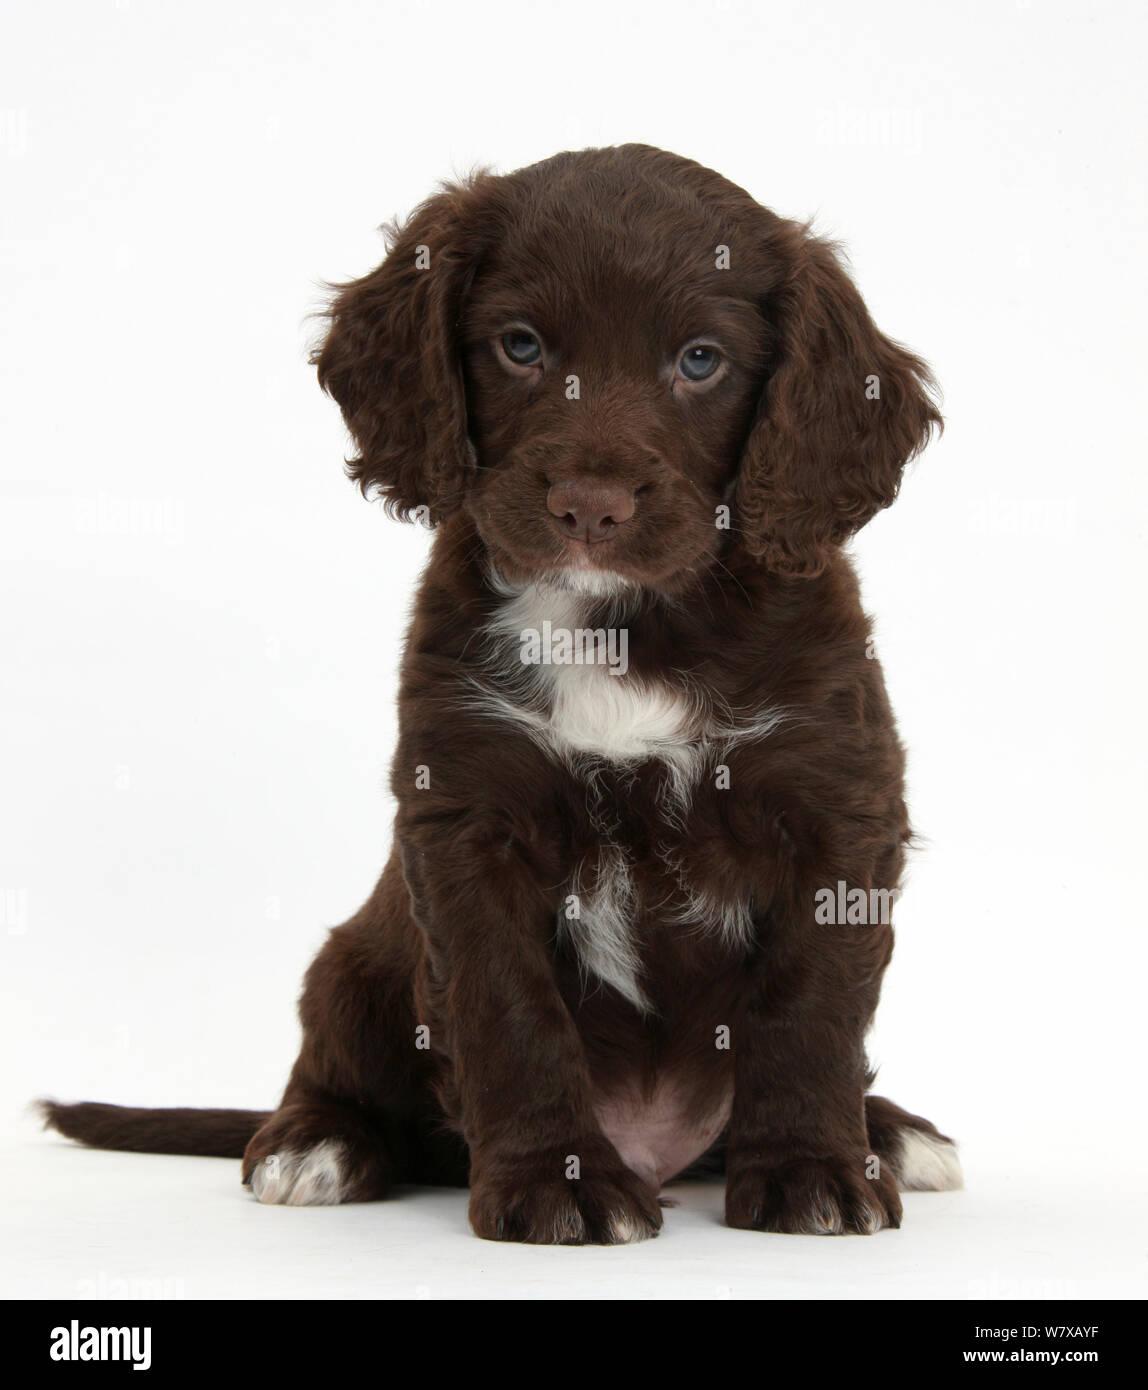 Chocolate Cocker Spaniel Puppy Sitting Stock Photo Alamy